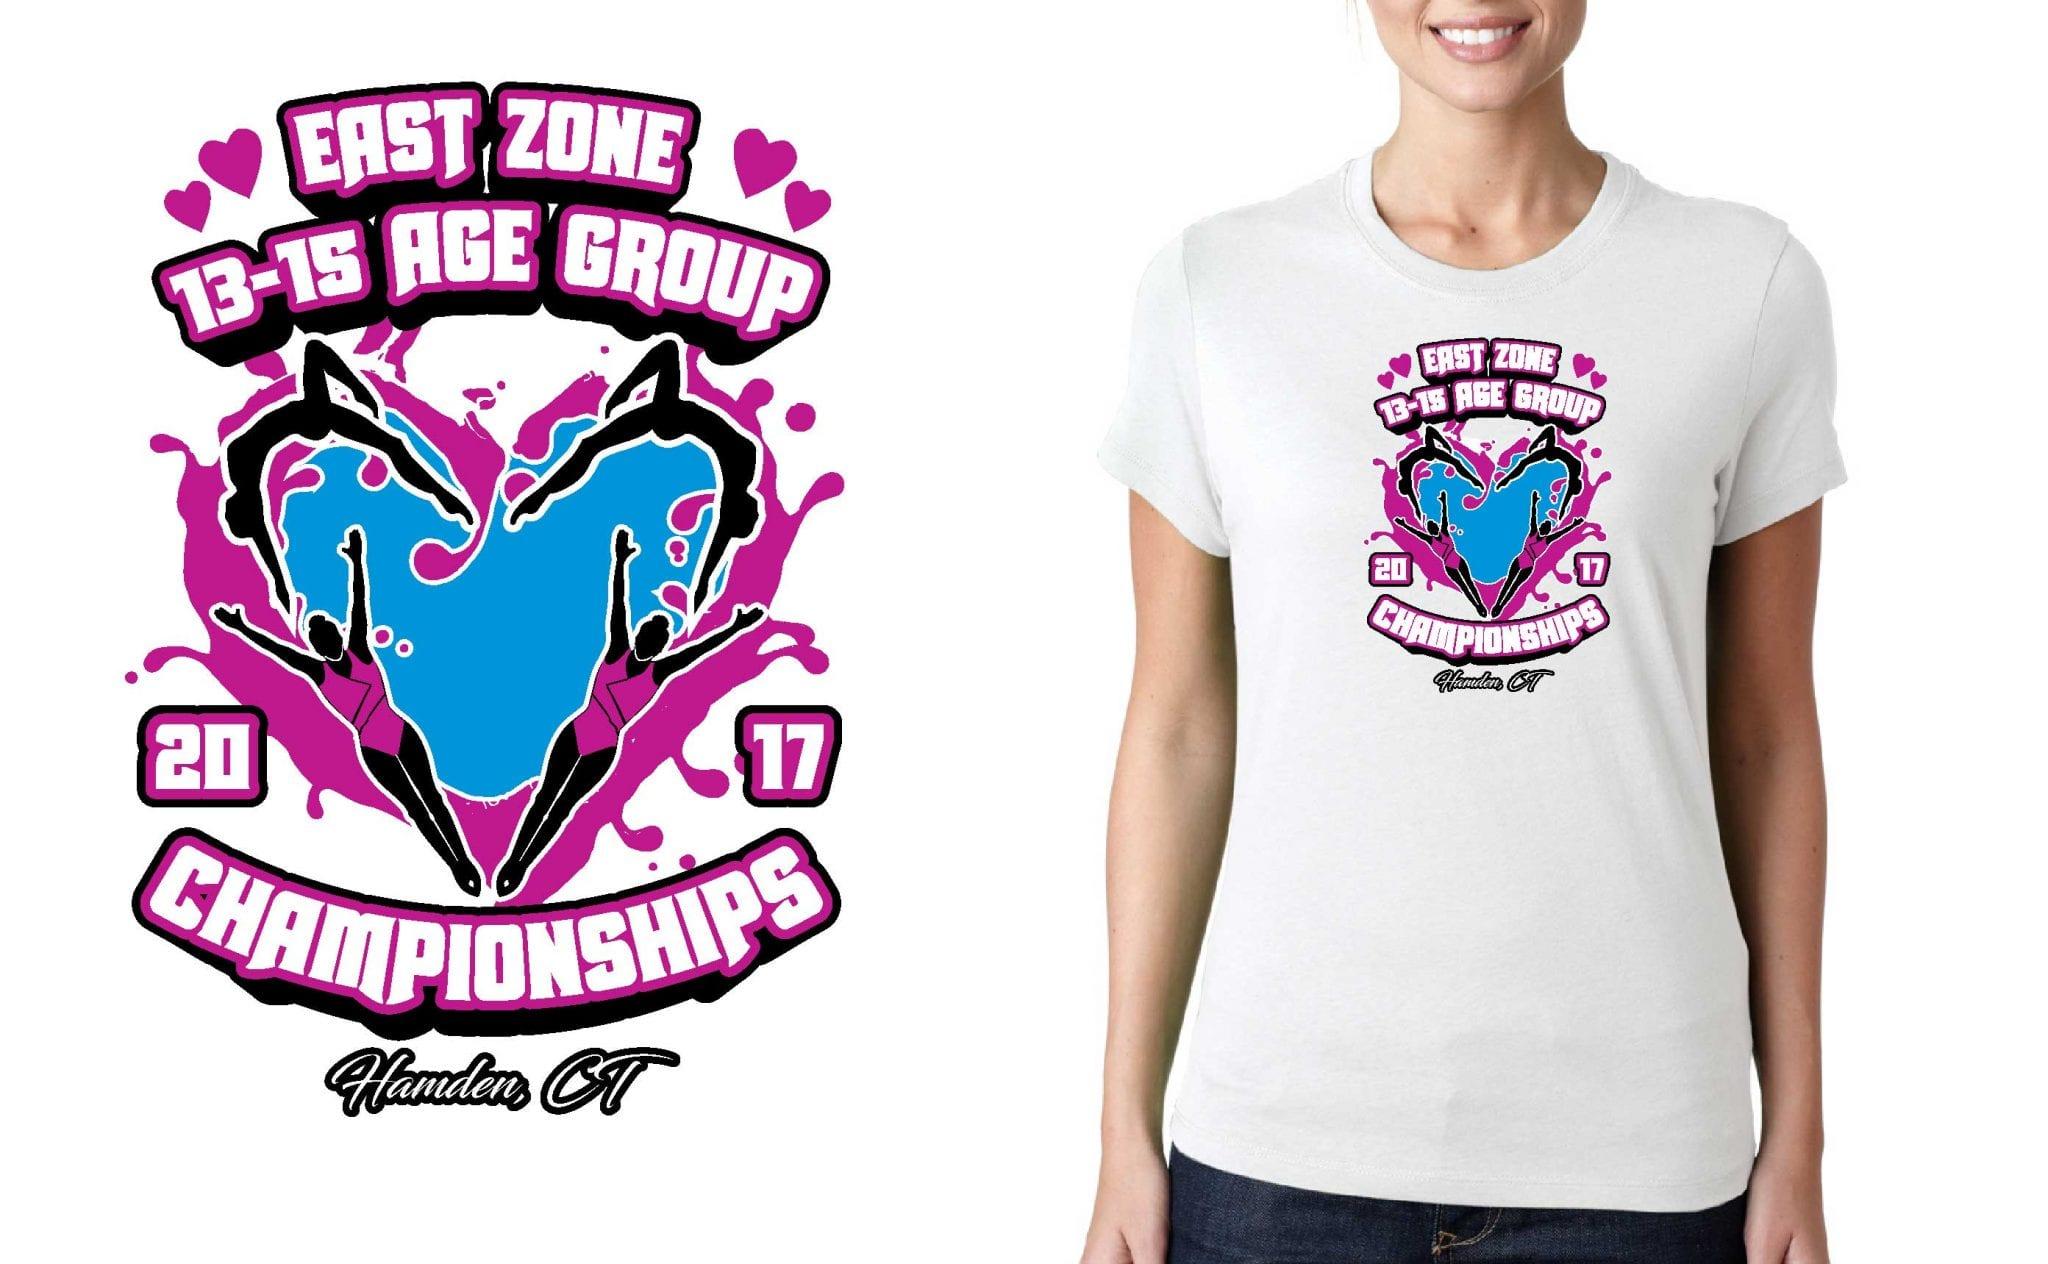 SWIMMING LOGO for East-Zone-13-15-Age-Group-Championships T-SHIRT UrArtStudio